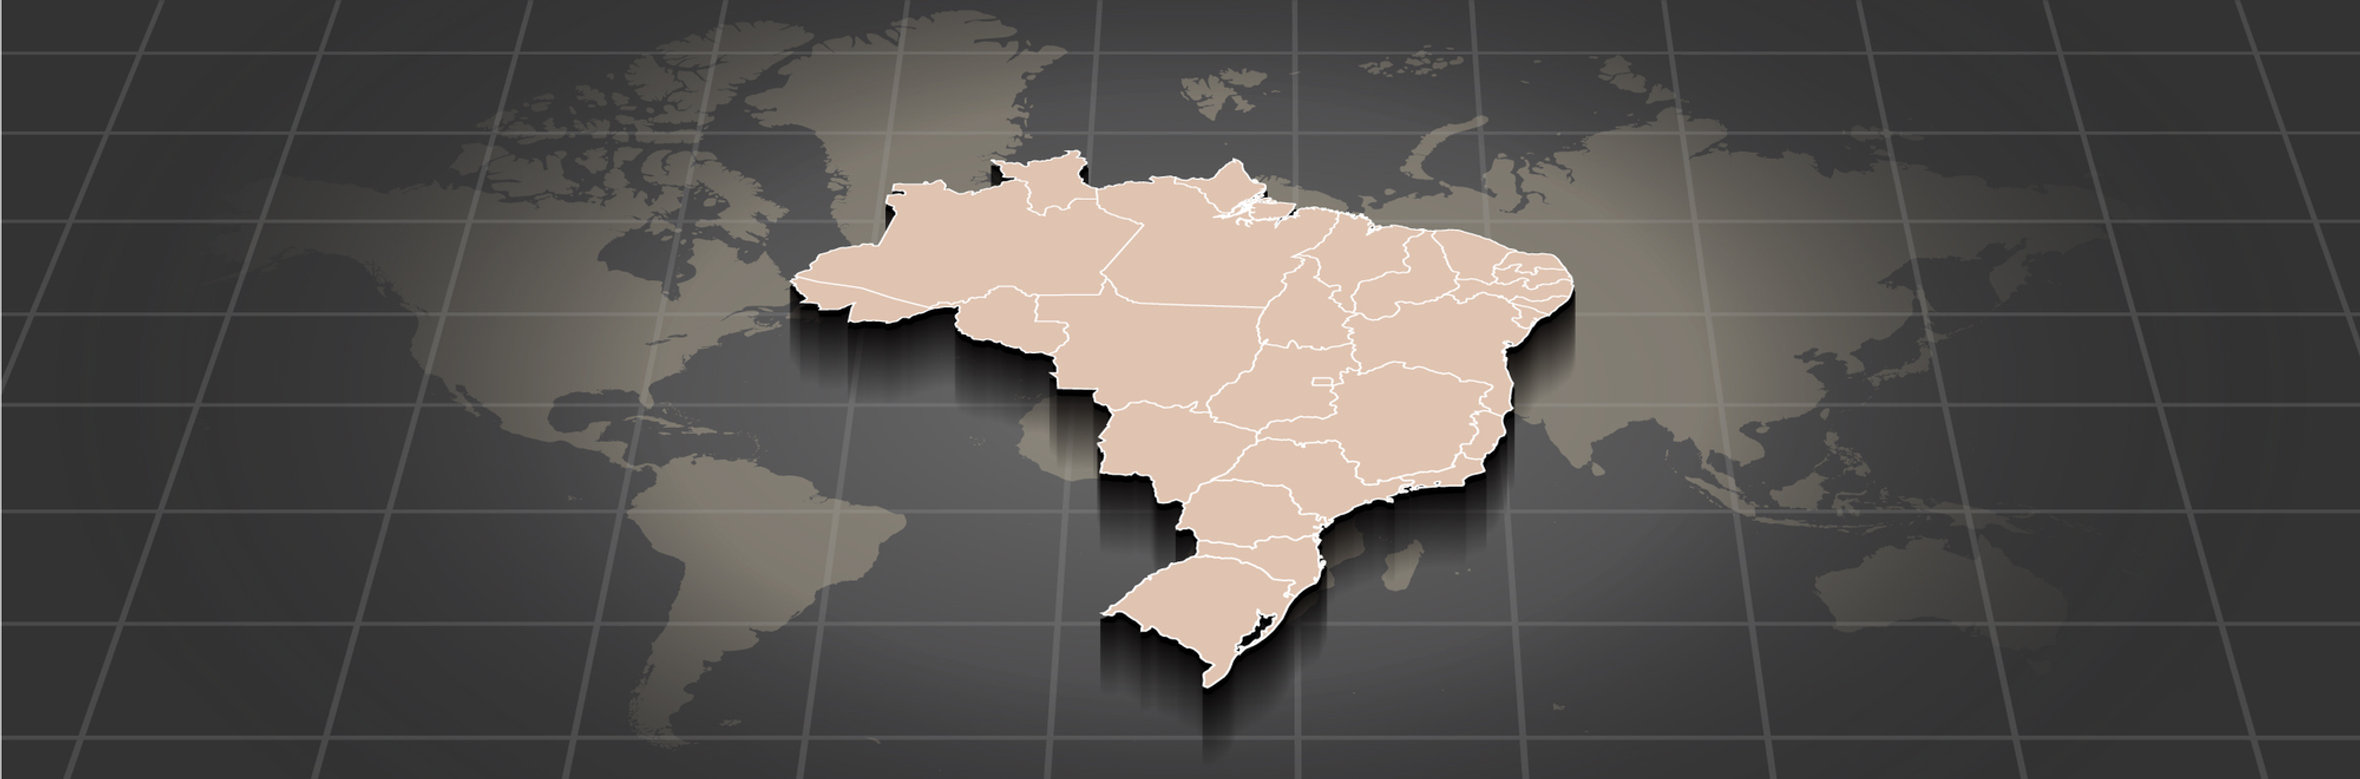 mapa_brasil_perspectiva.jpg